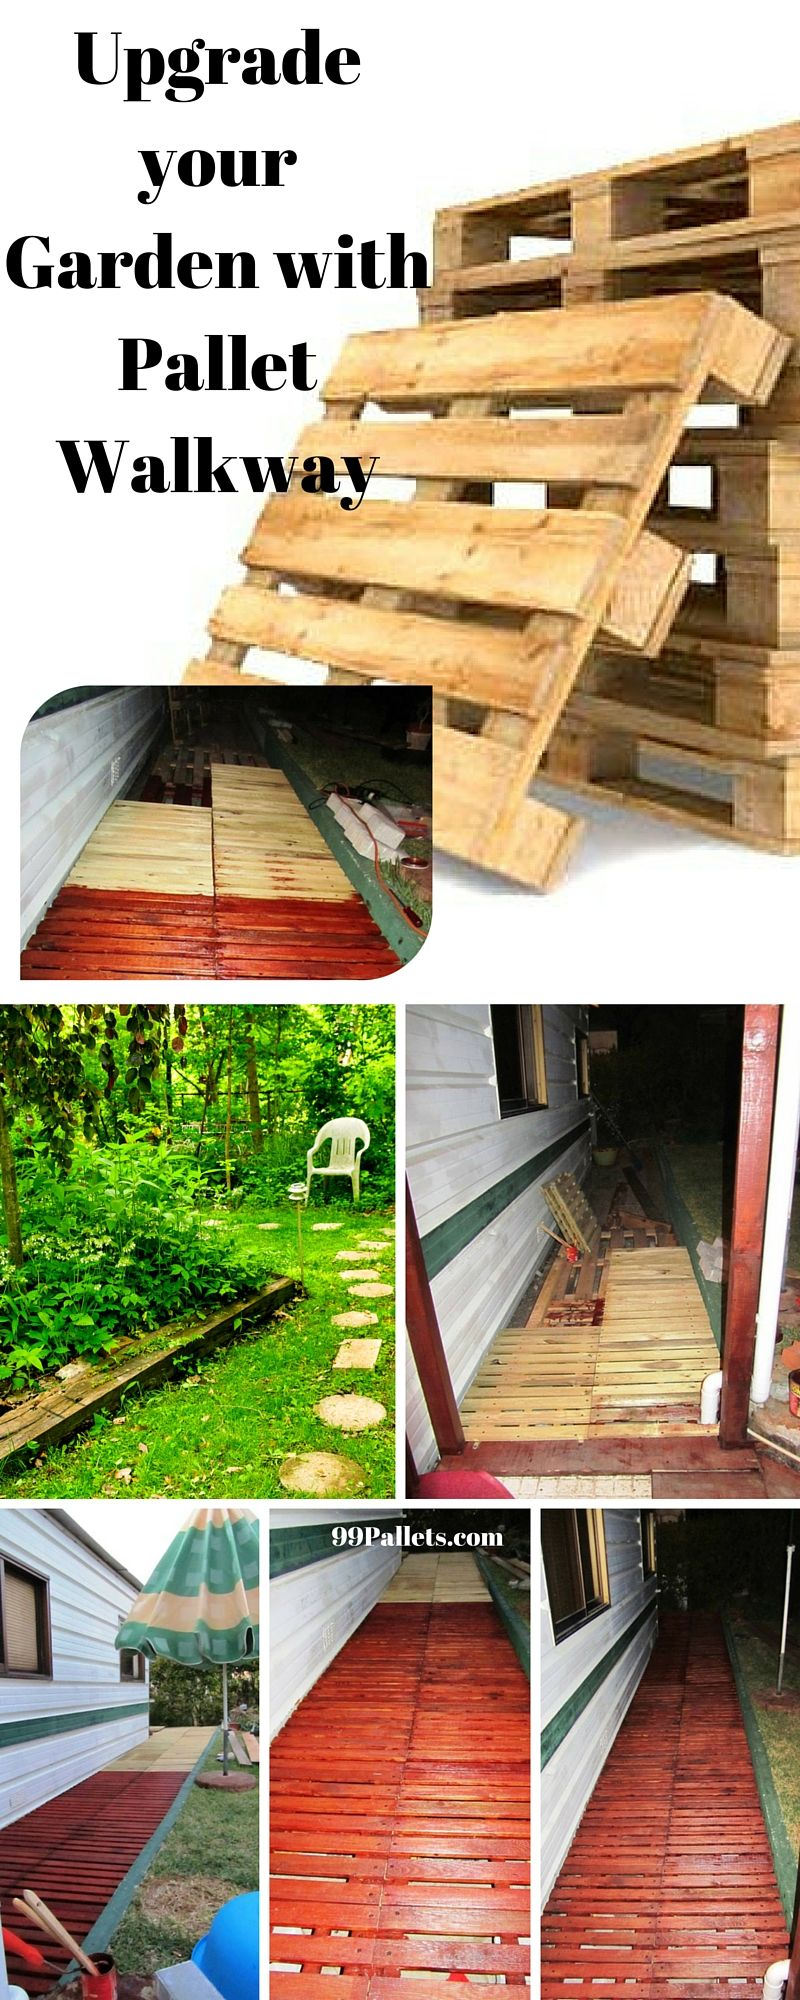 Pallet Walkway - Wooden Sidewalk Ideas | Pallet walkway ...